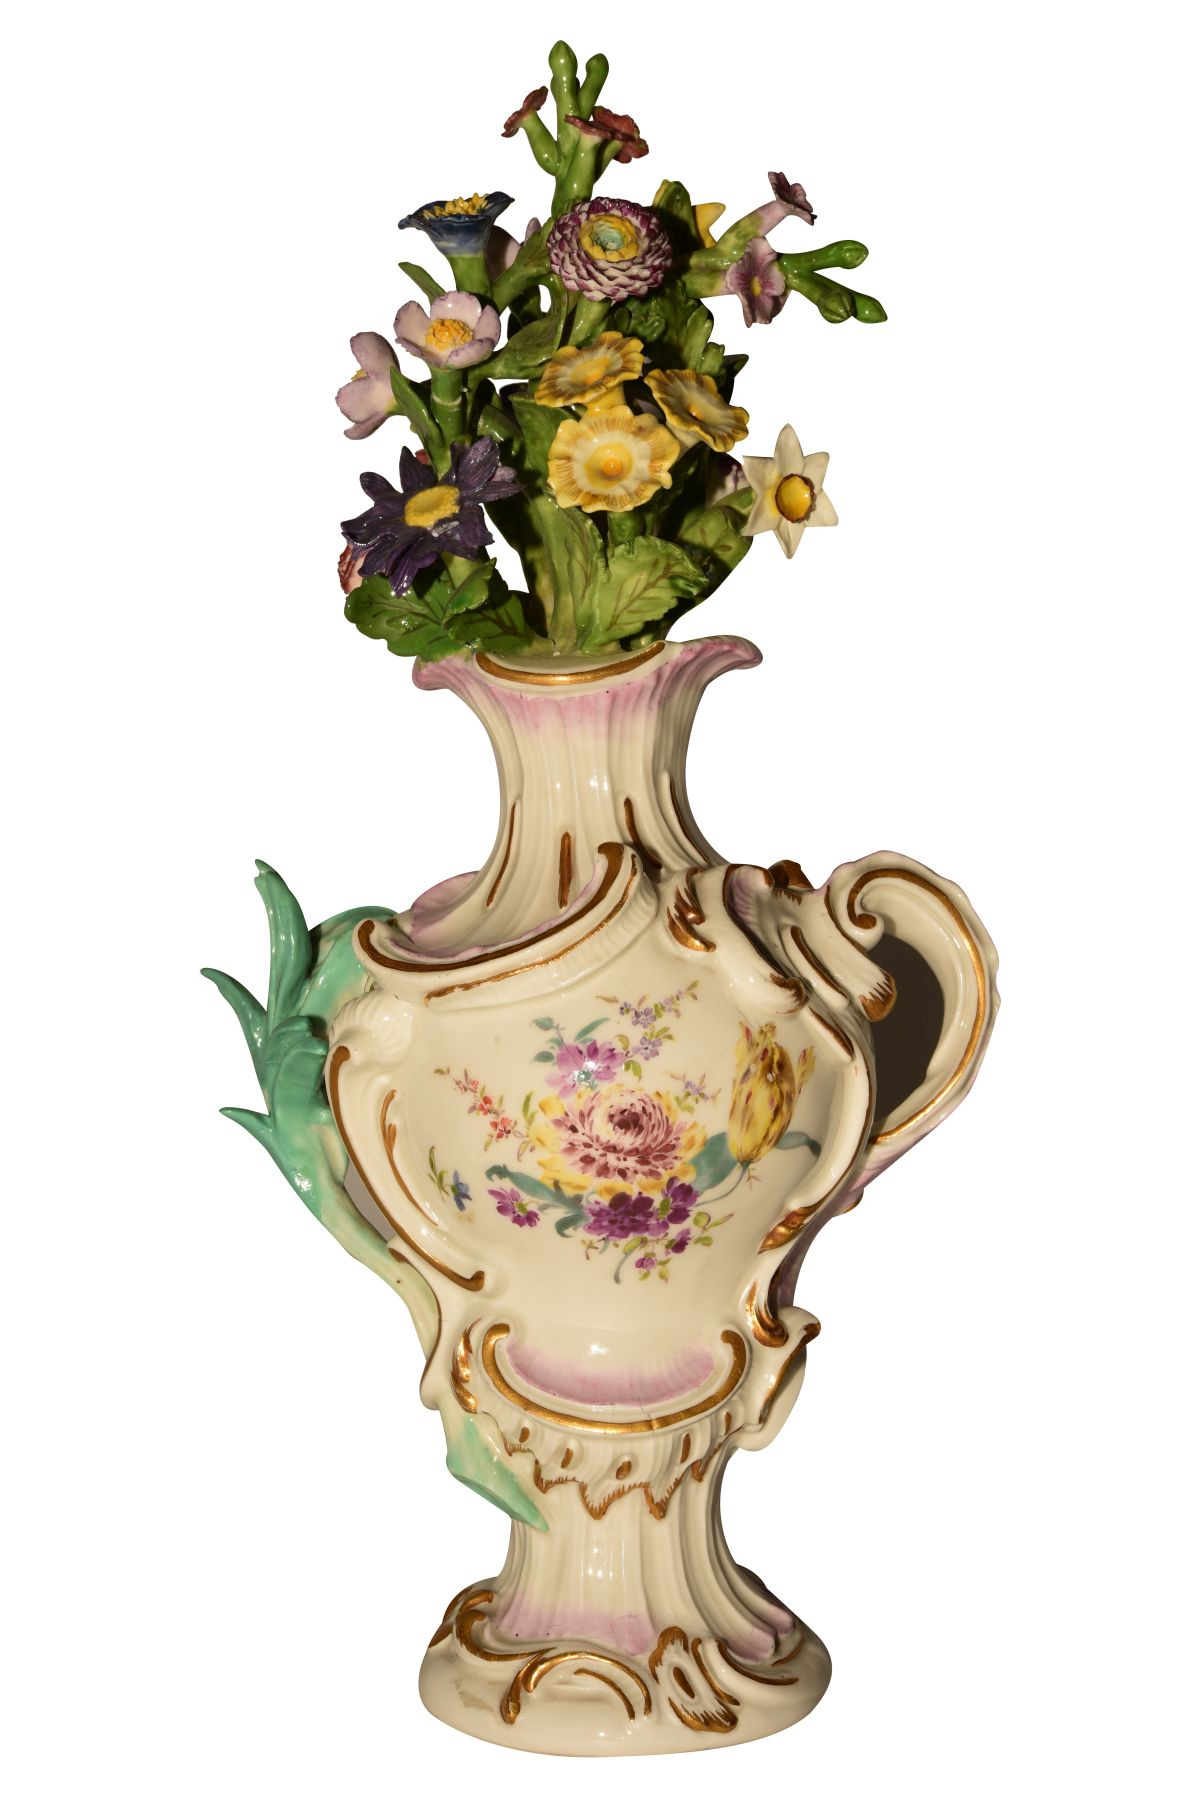 #114 Potpourri vase Meissen around 1750 | Pot Pouri Vase Meissen um 1750 Image